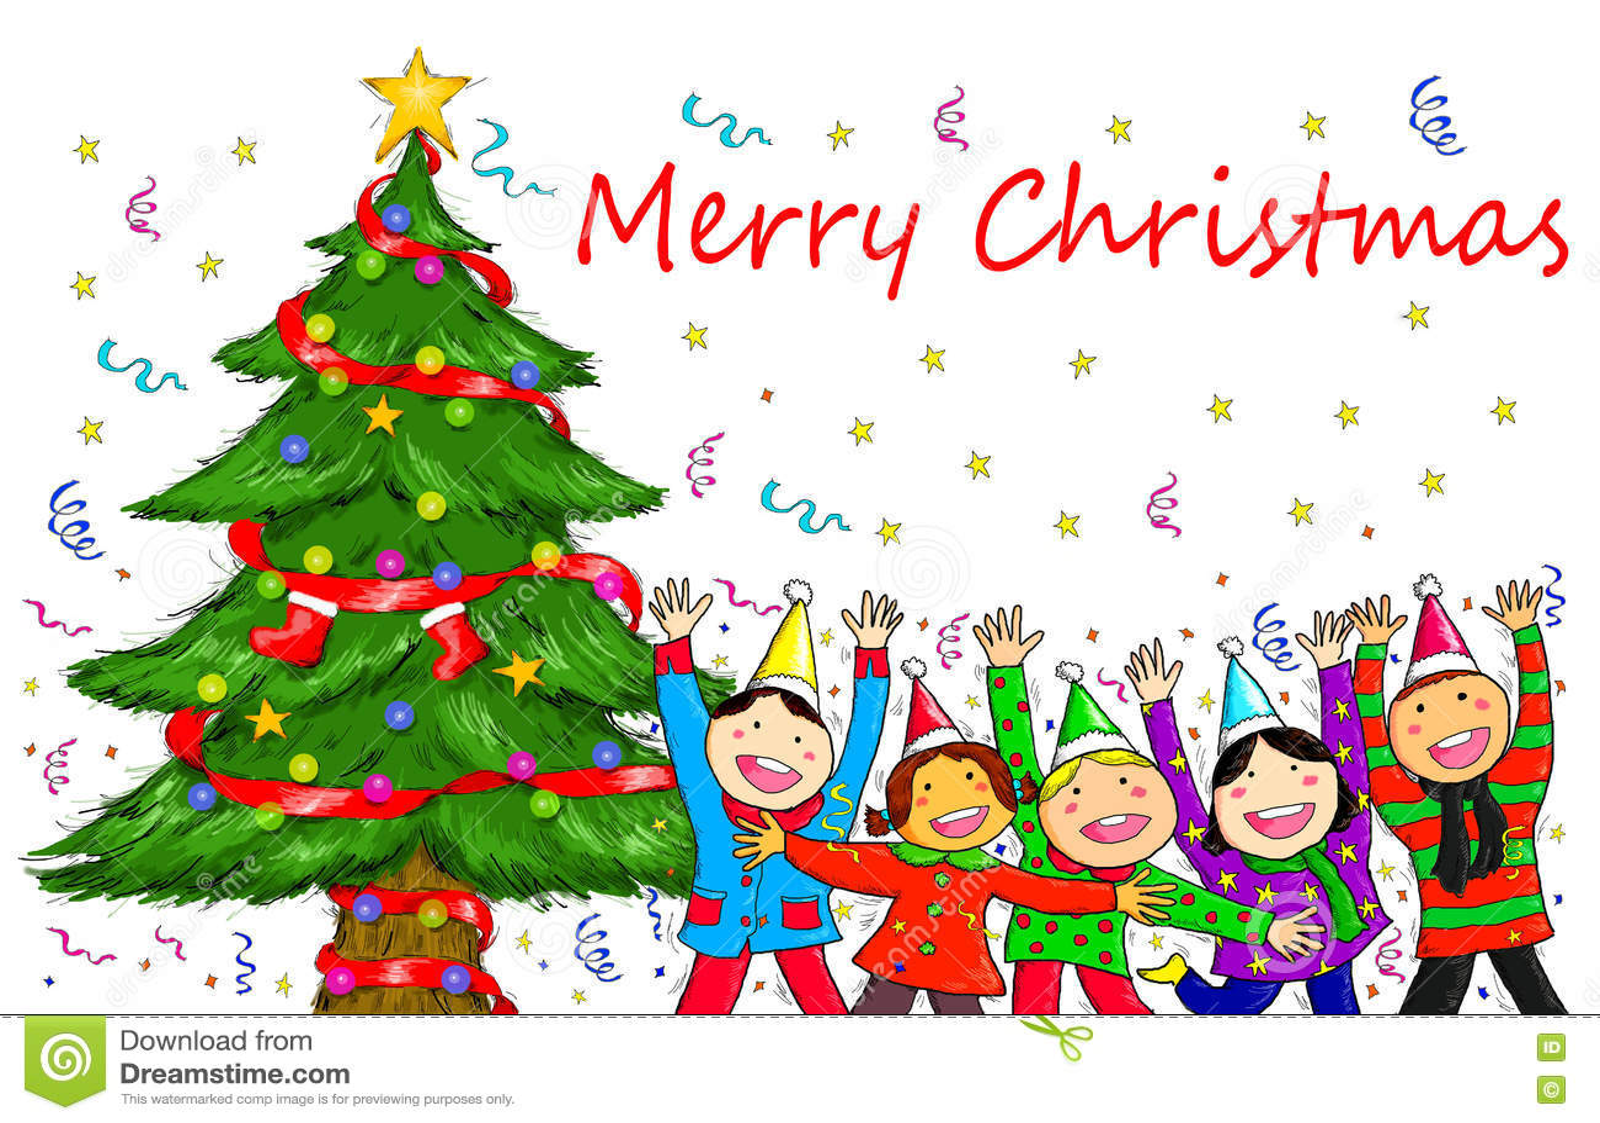 Christmas Celebration Images For Drawing.People Christmas Tree Holiday Celebration Stock Illustration